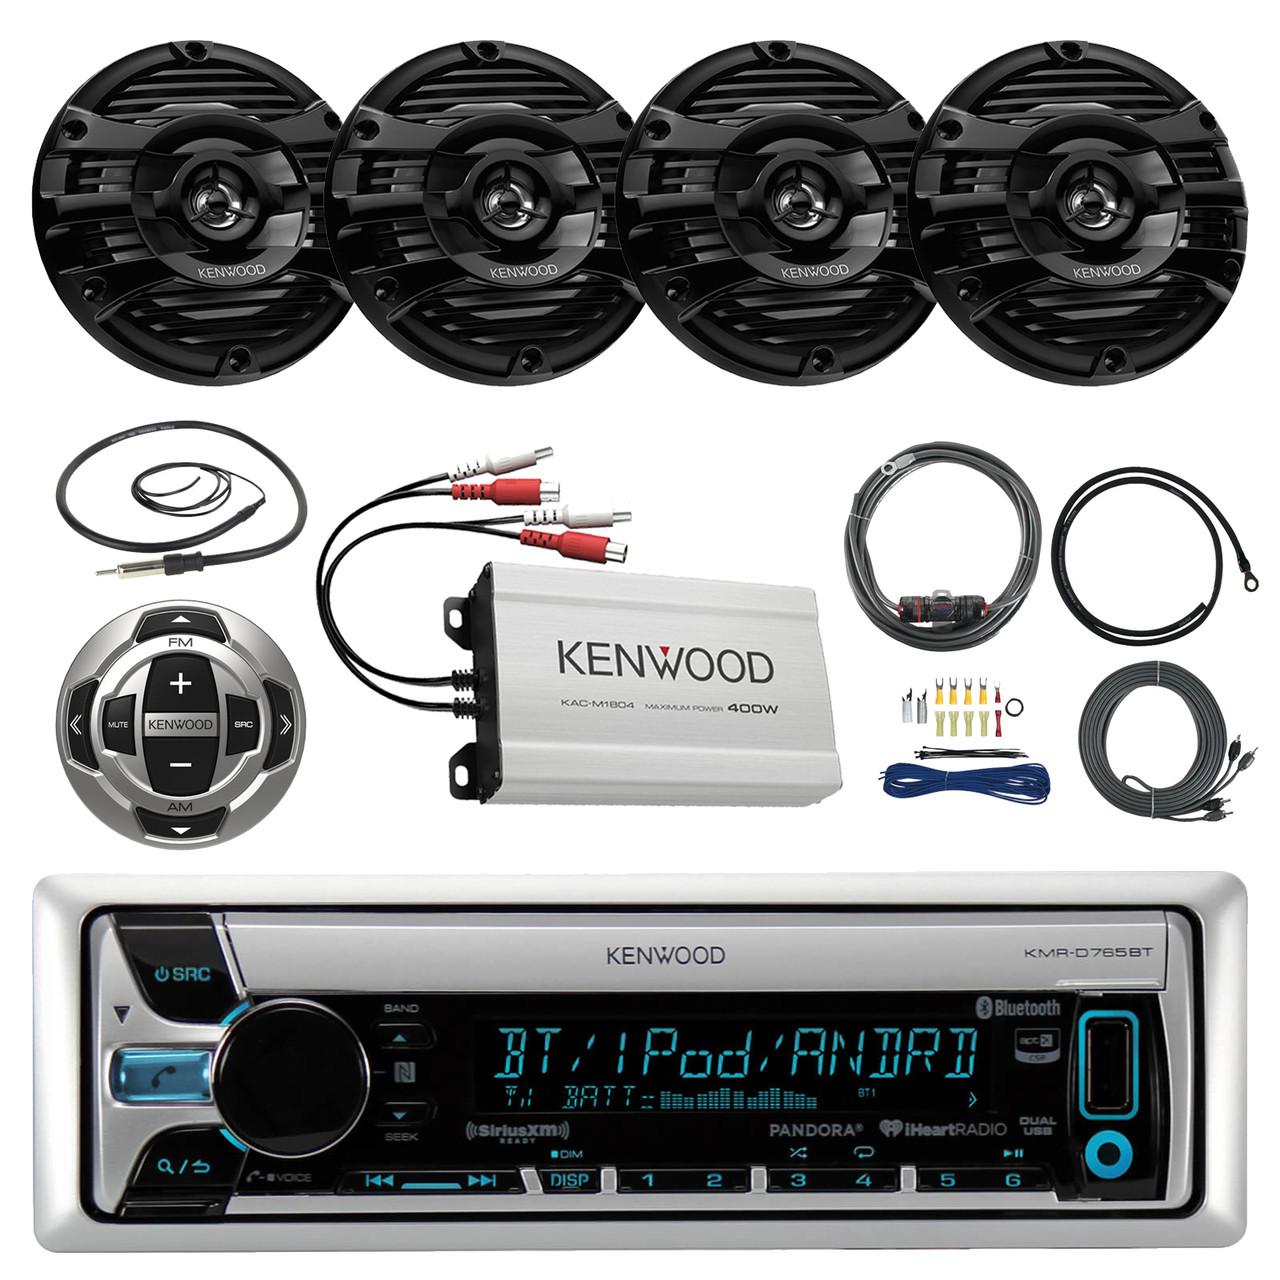 medium resolution of 21 29 pontoon boat marine system kenwood kmr d768bt bluetooth receiver 4 x 6 5 speakers 4 channel amplifer kenwood wired remote t spec v8 series